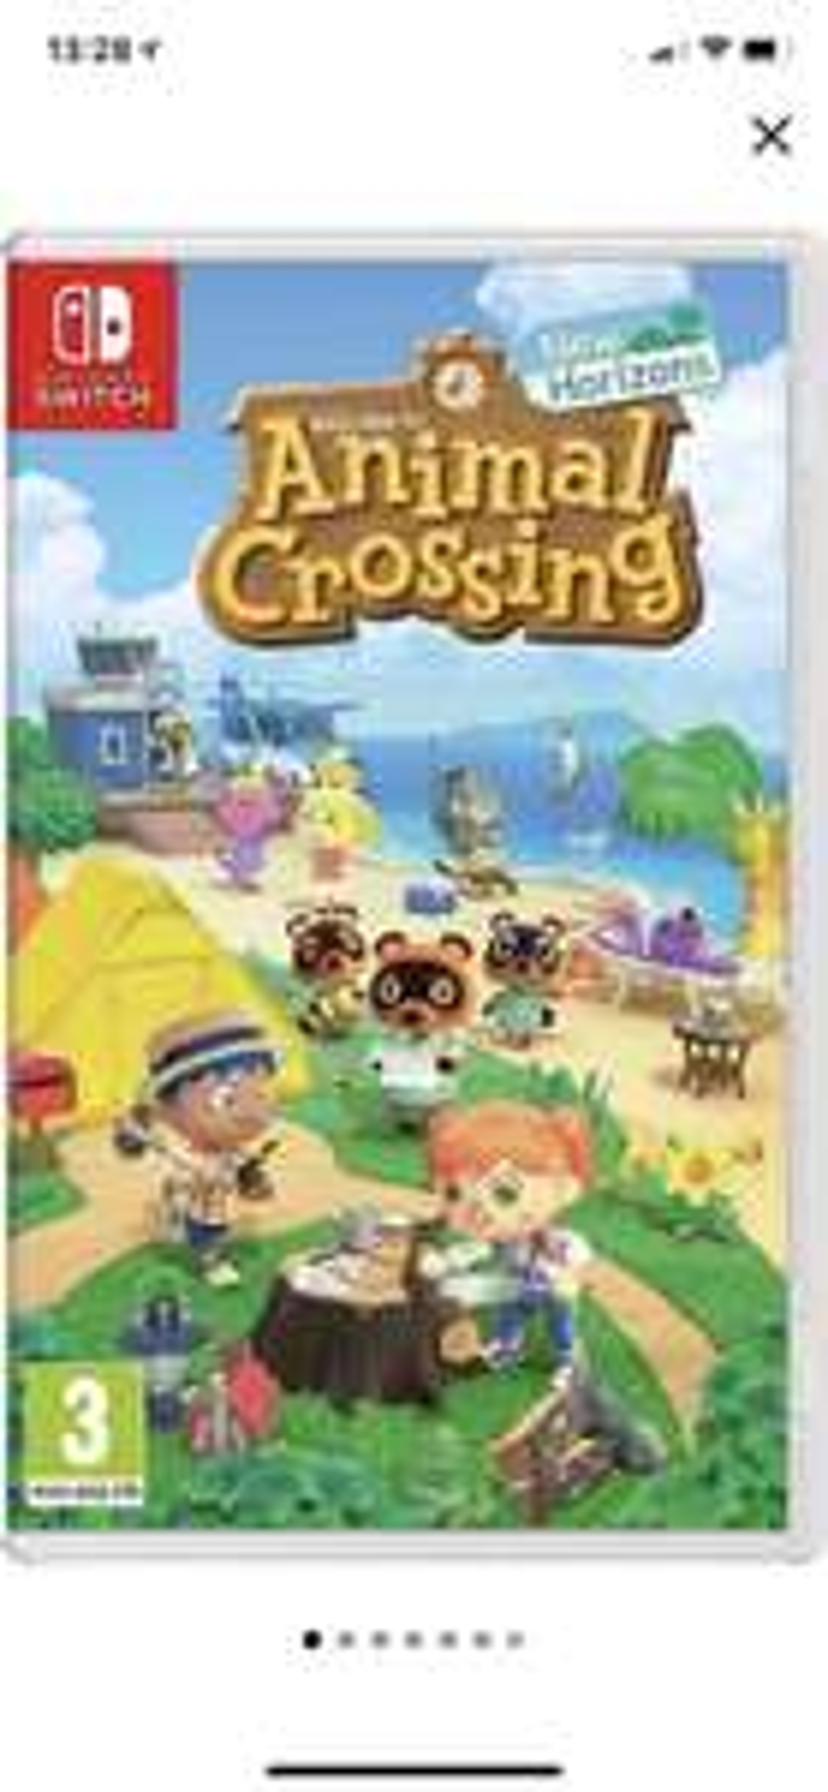 Nintendo Switch: Animal Crossing [amazon.es]